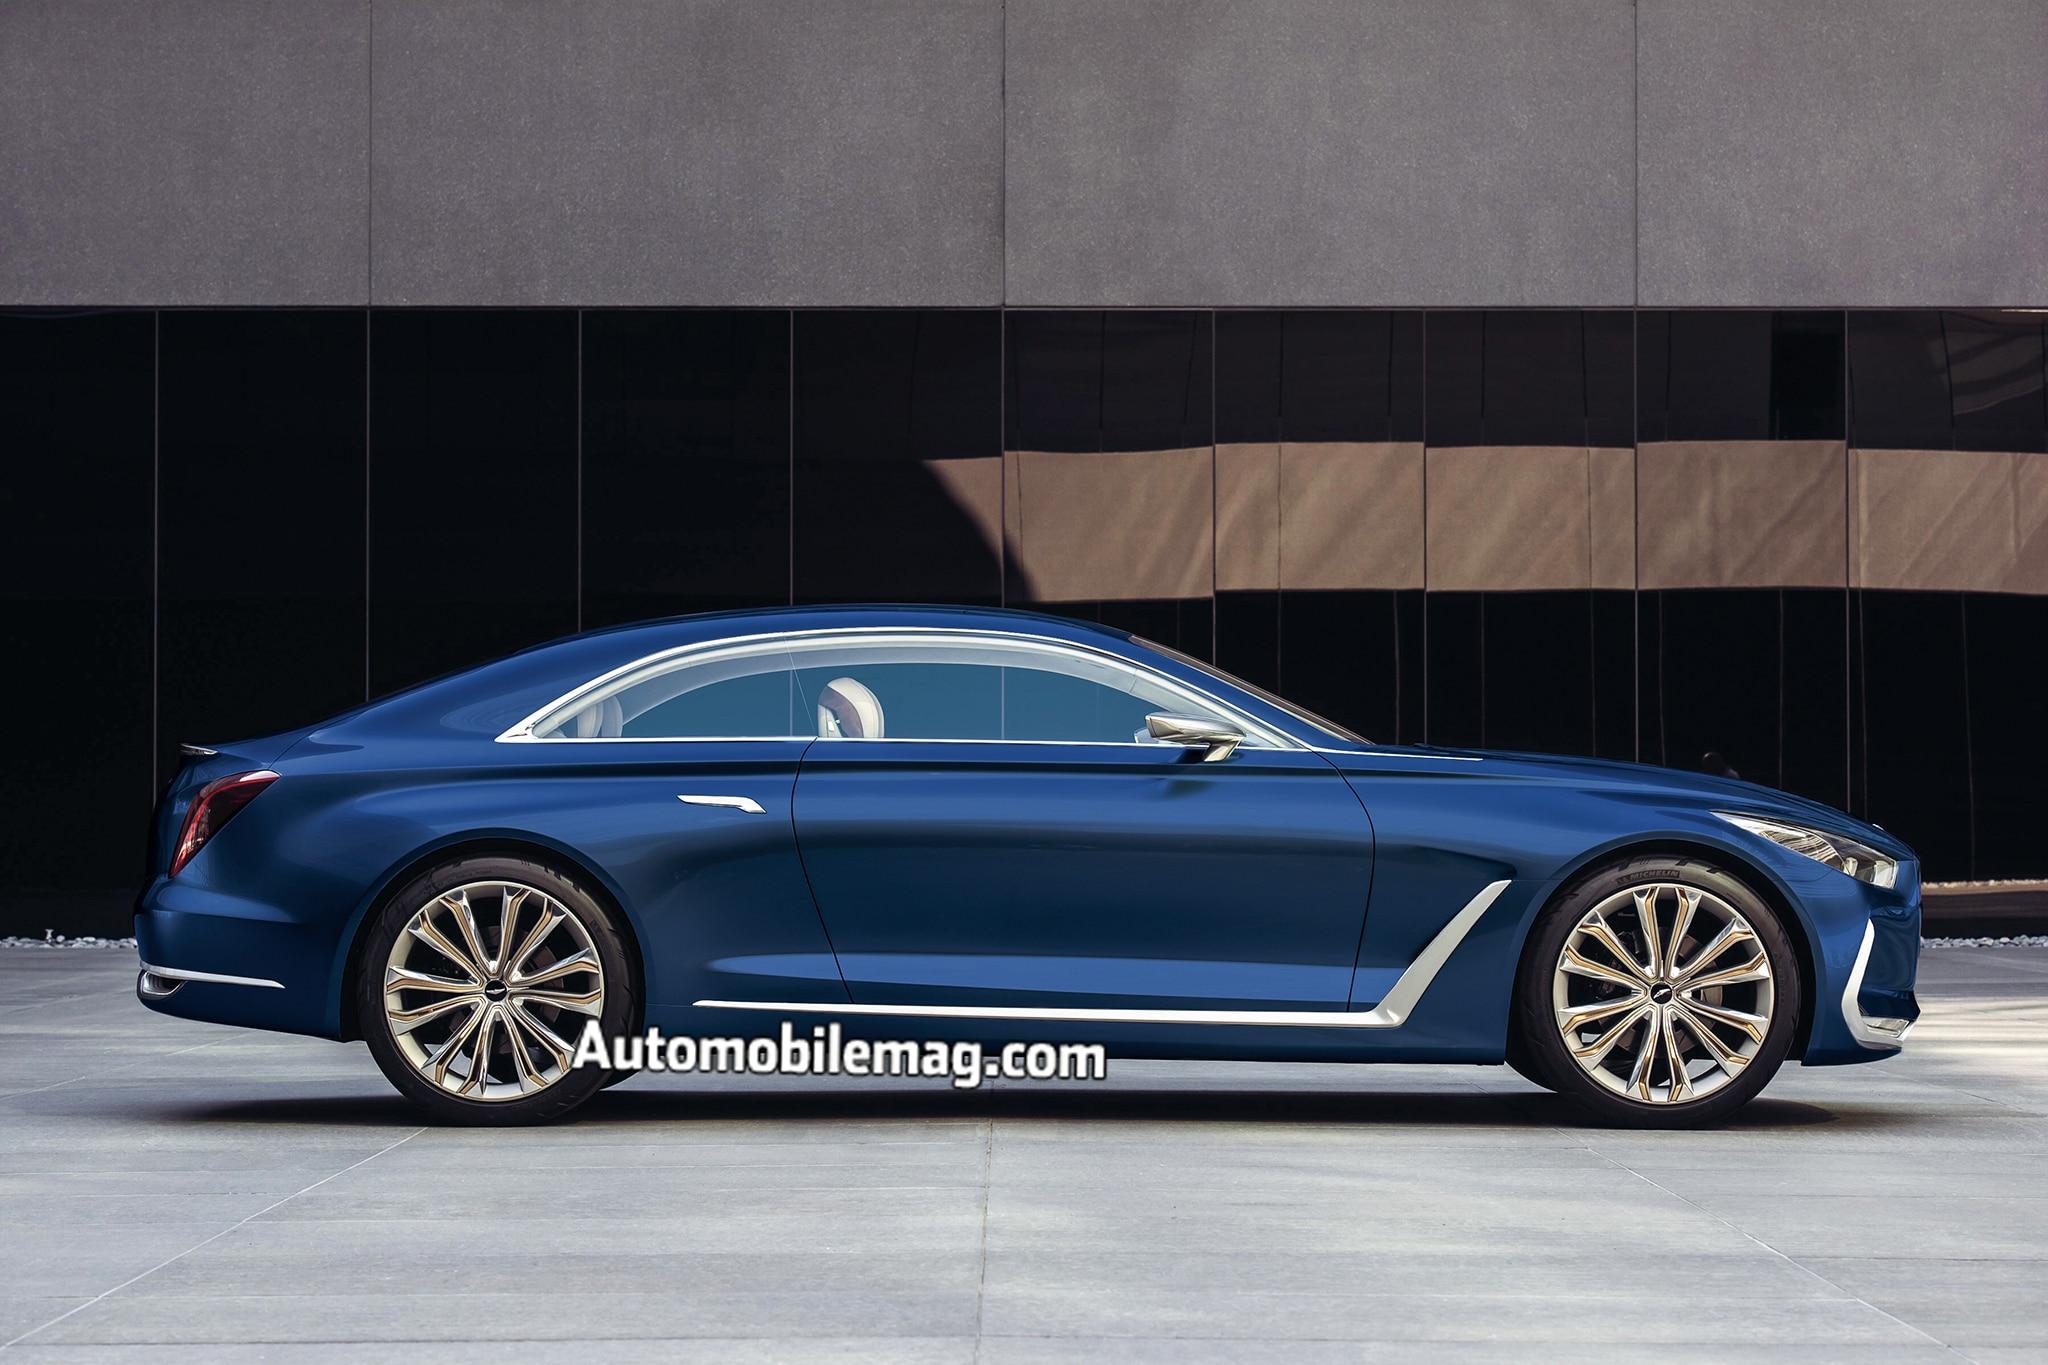 2016 Hyundai Genesis Coupe >> 25 Future Cars You Won't Want to Miss | Automobile Magazine